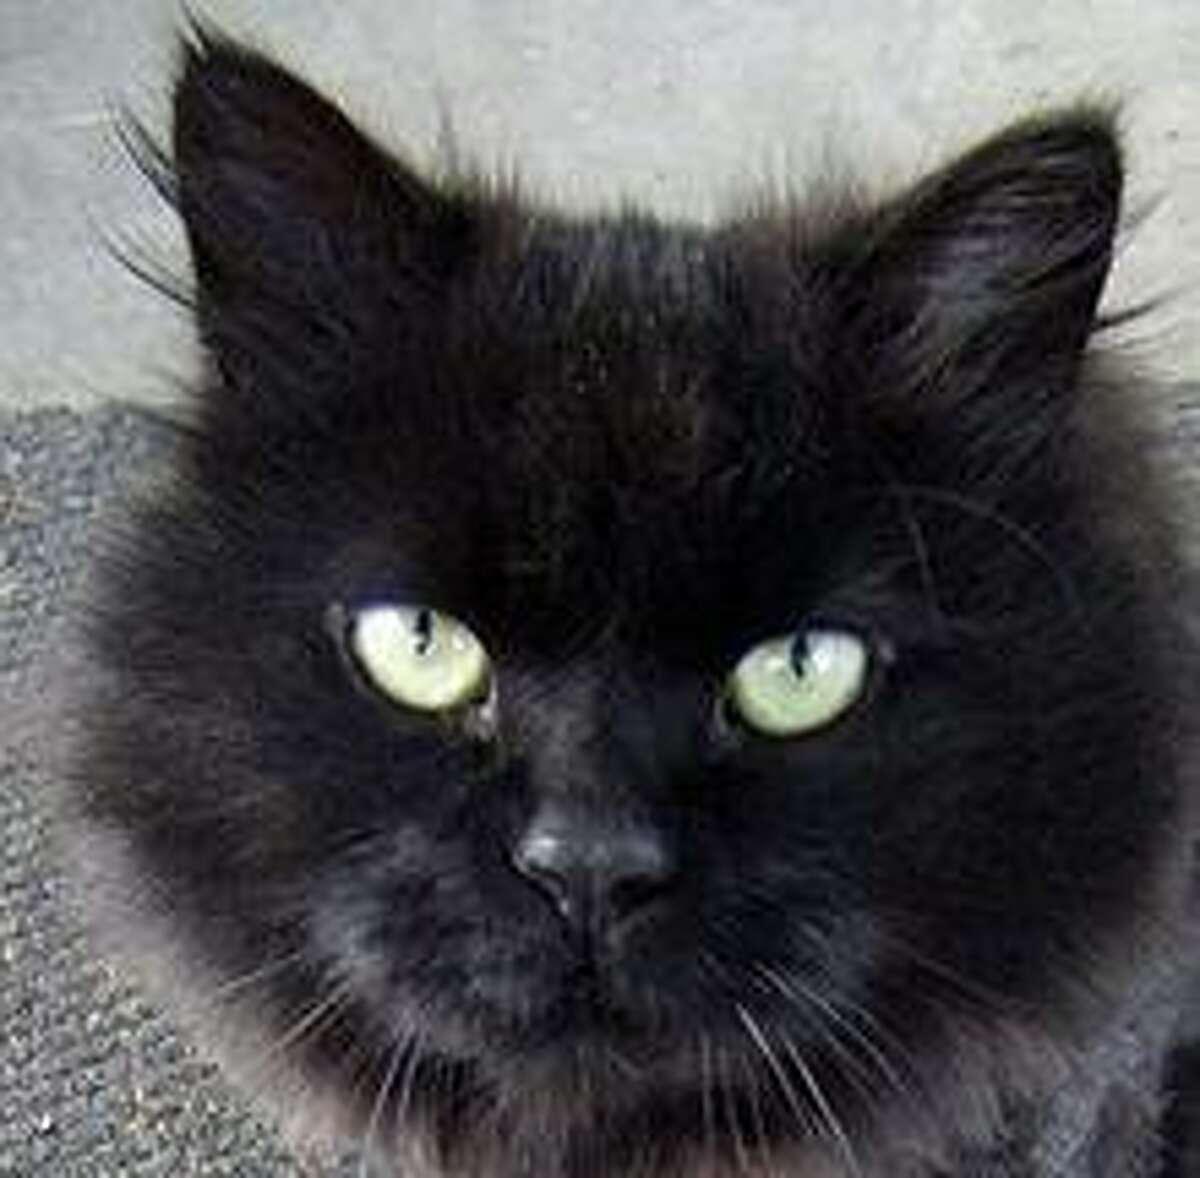 Jon Saunders' cat, Boo.